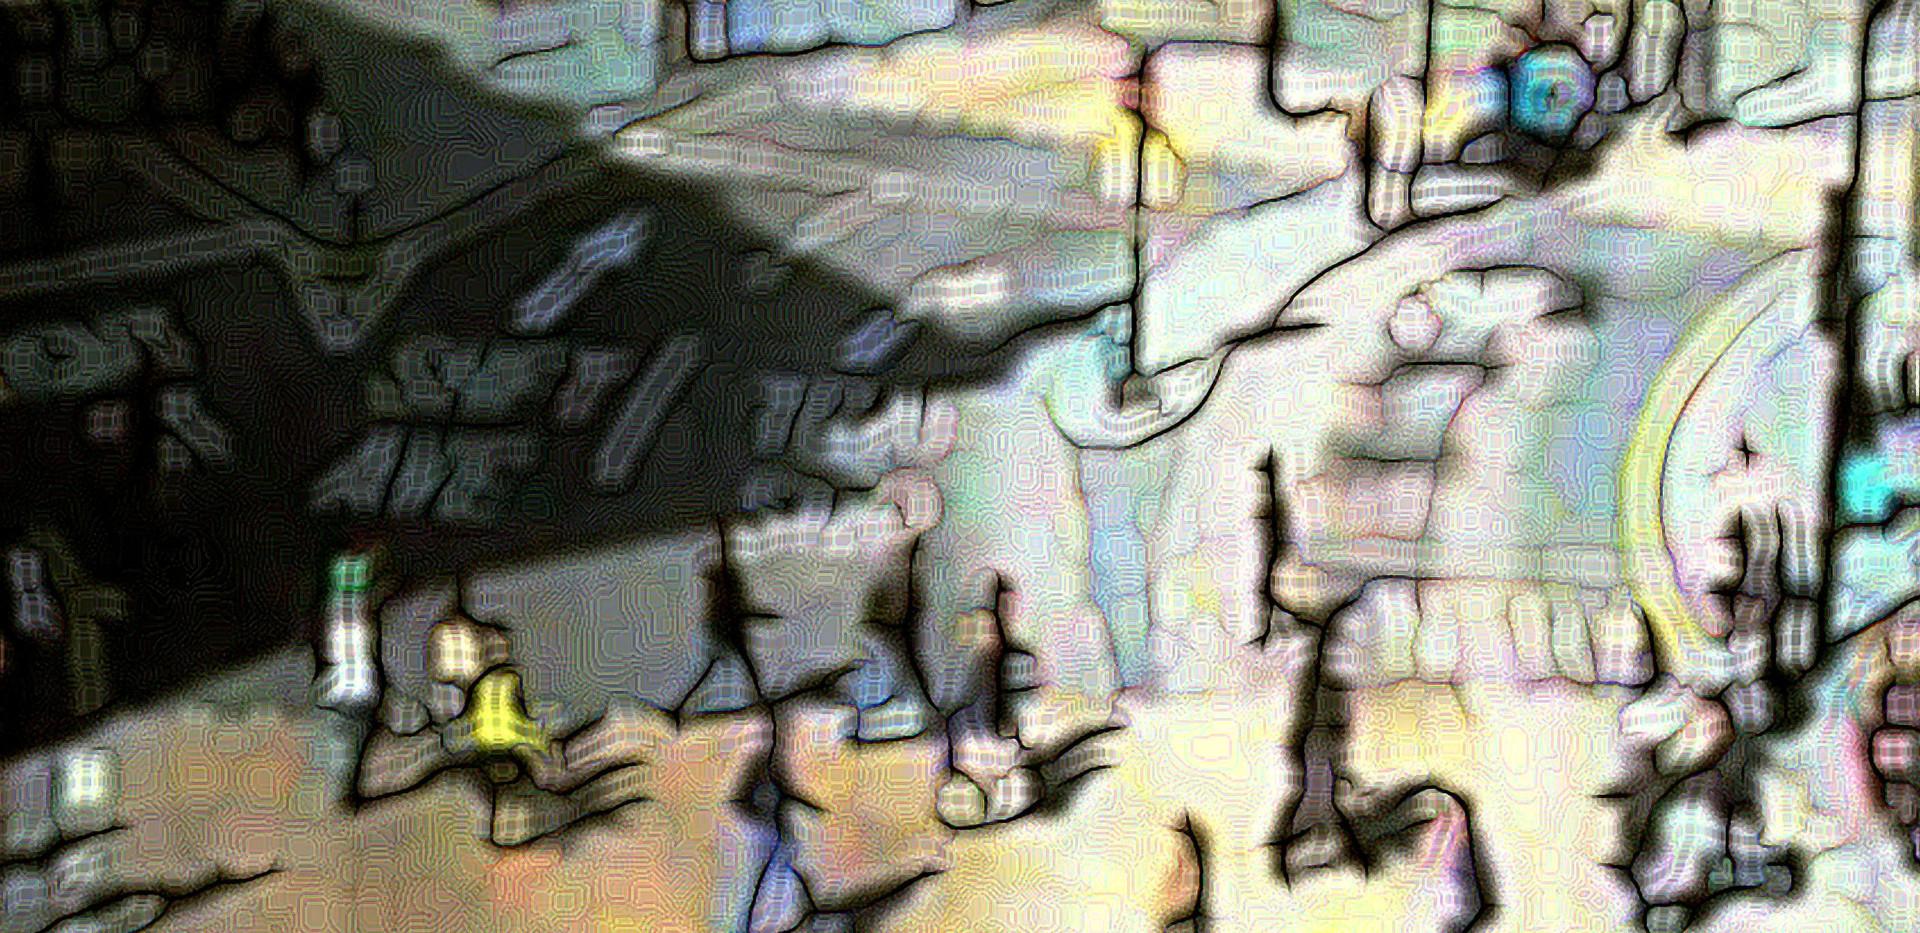 Public Webcam| 28.04.15 | Piccadilly |  80x60 cm | Edition 5 | Euro 900,-